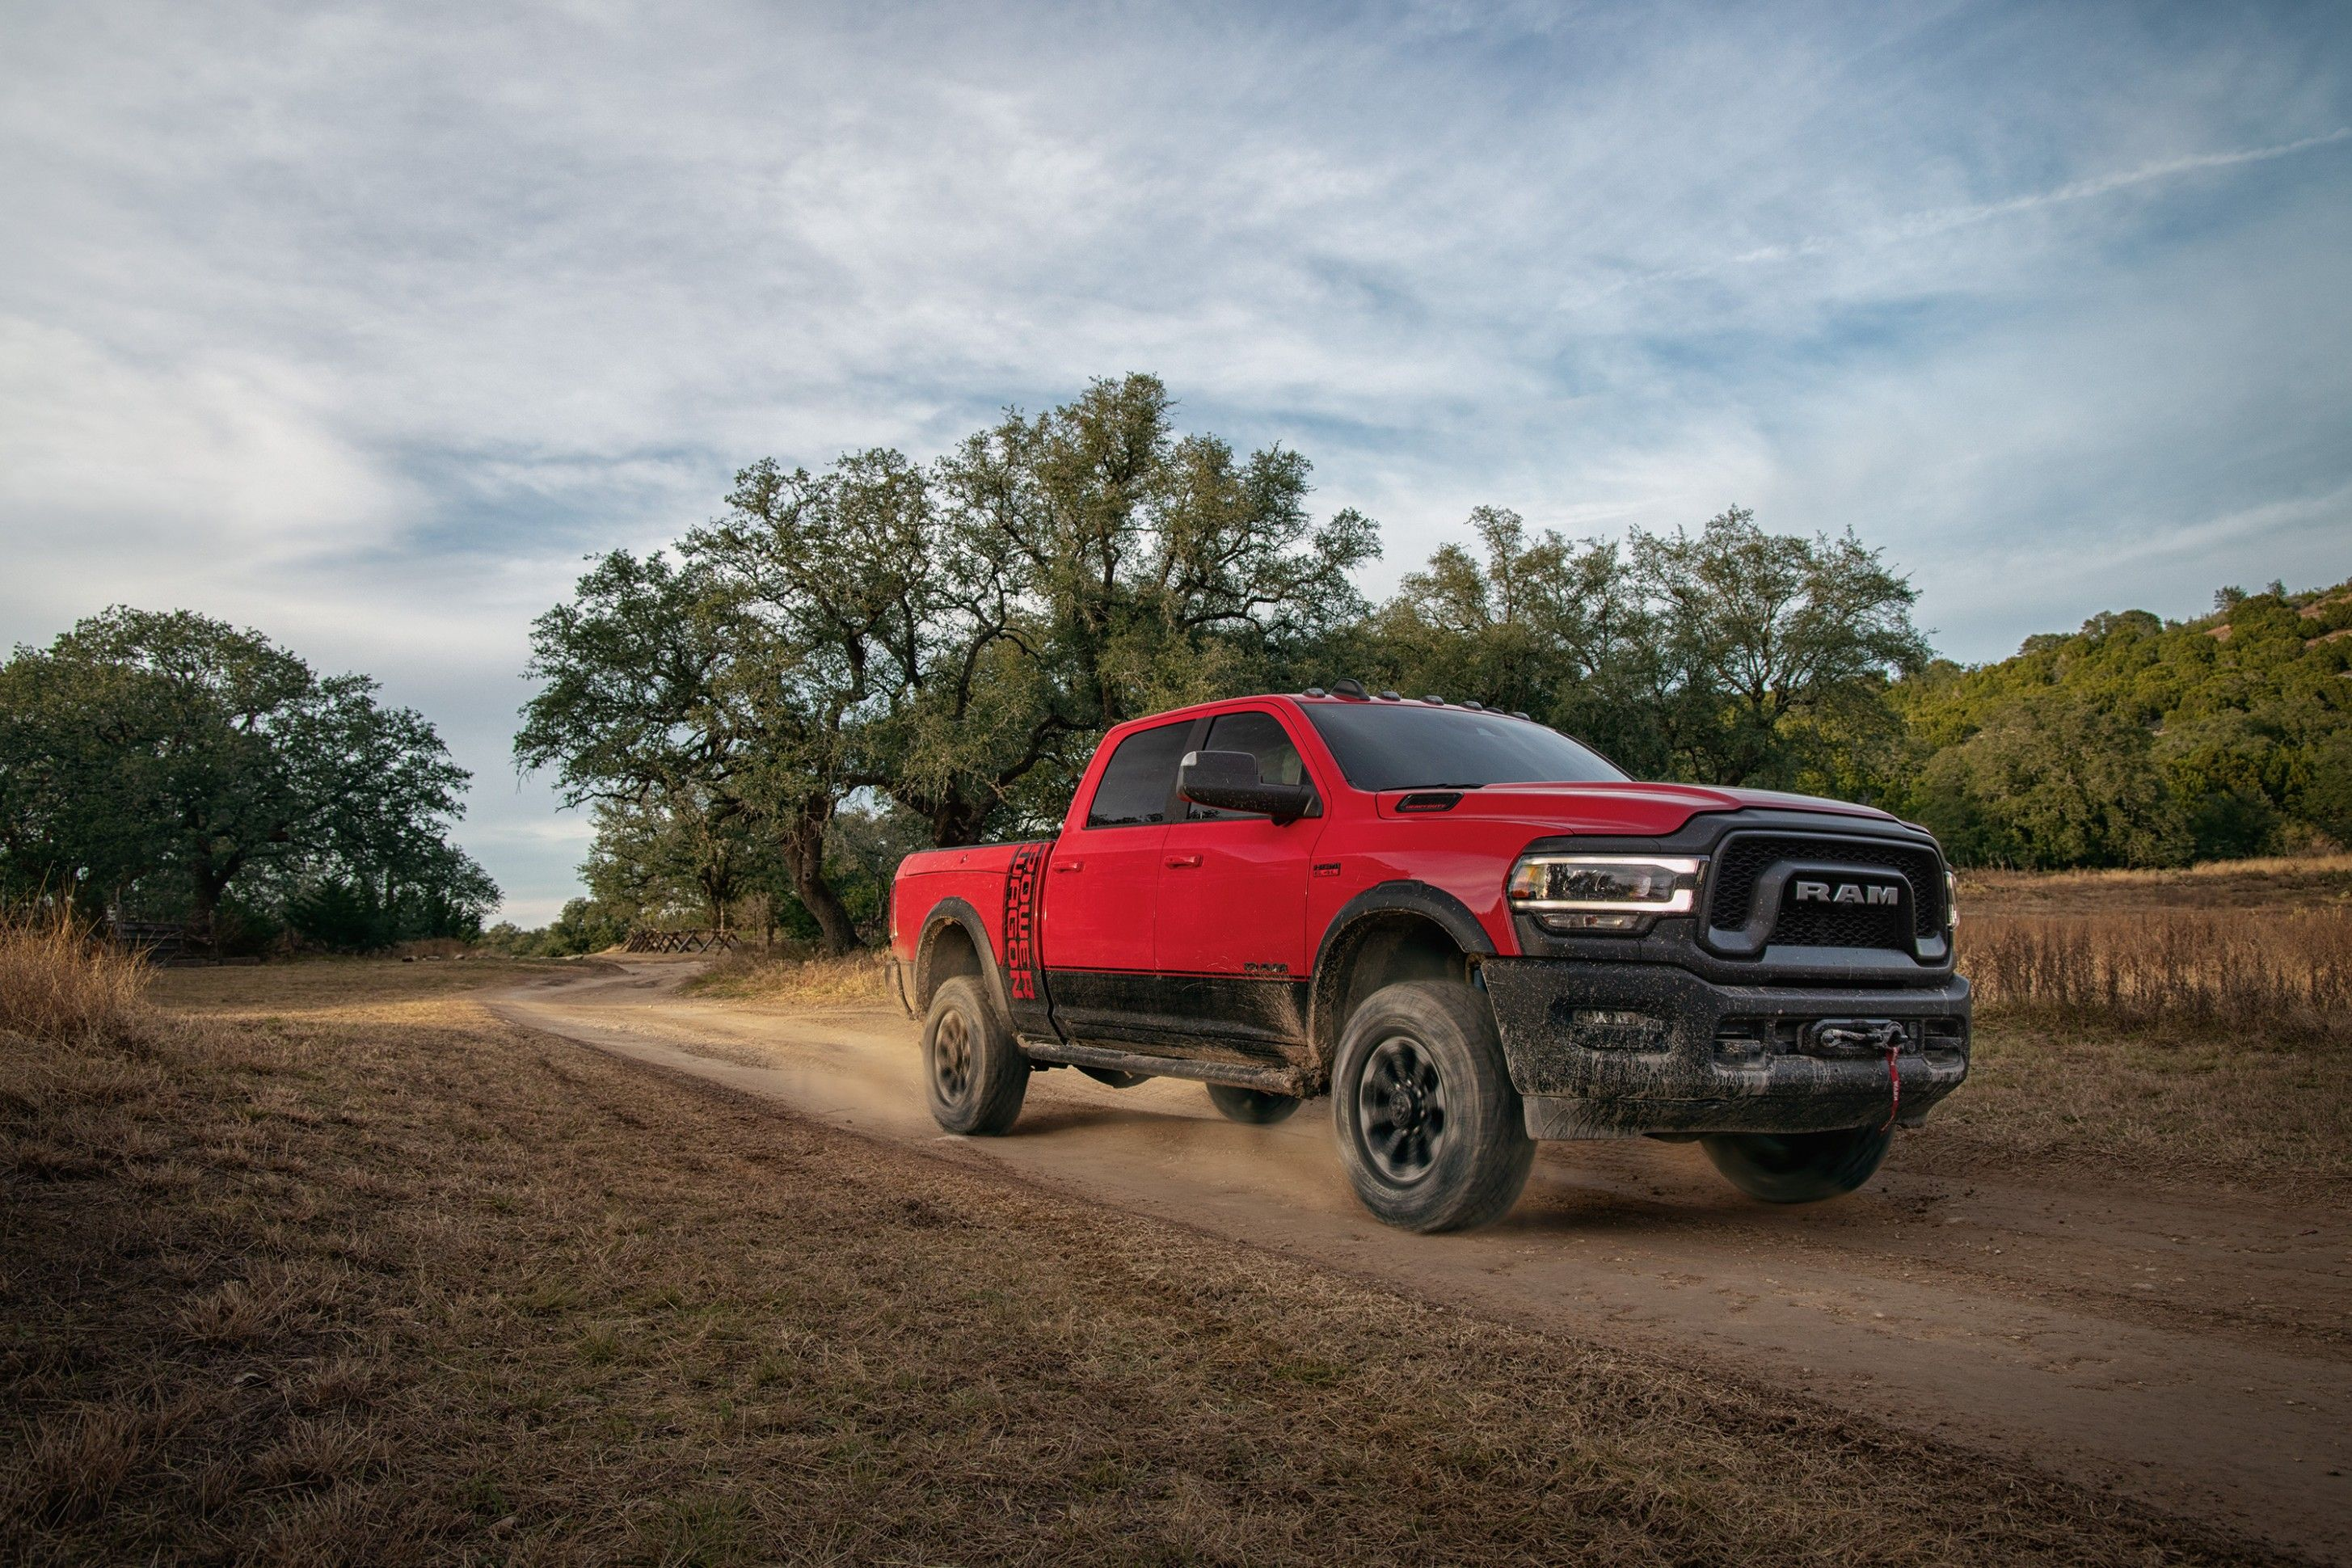 Dodge Power Wagon 2020 Price Design And Dodge Power Wagon New Pickup Trucks Pickup Trucks